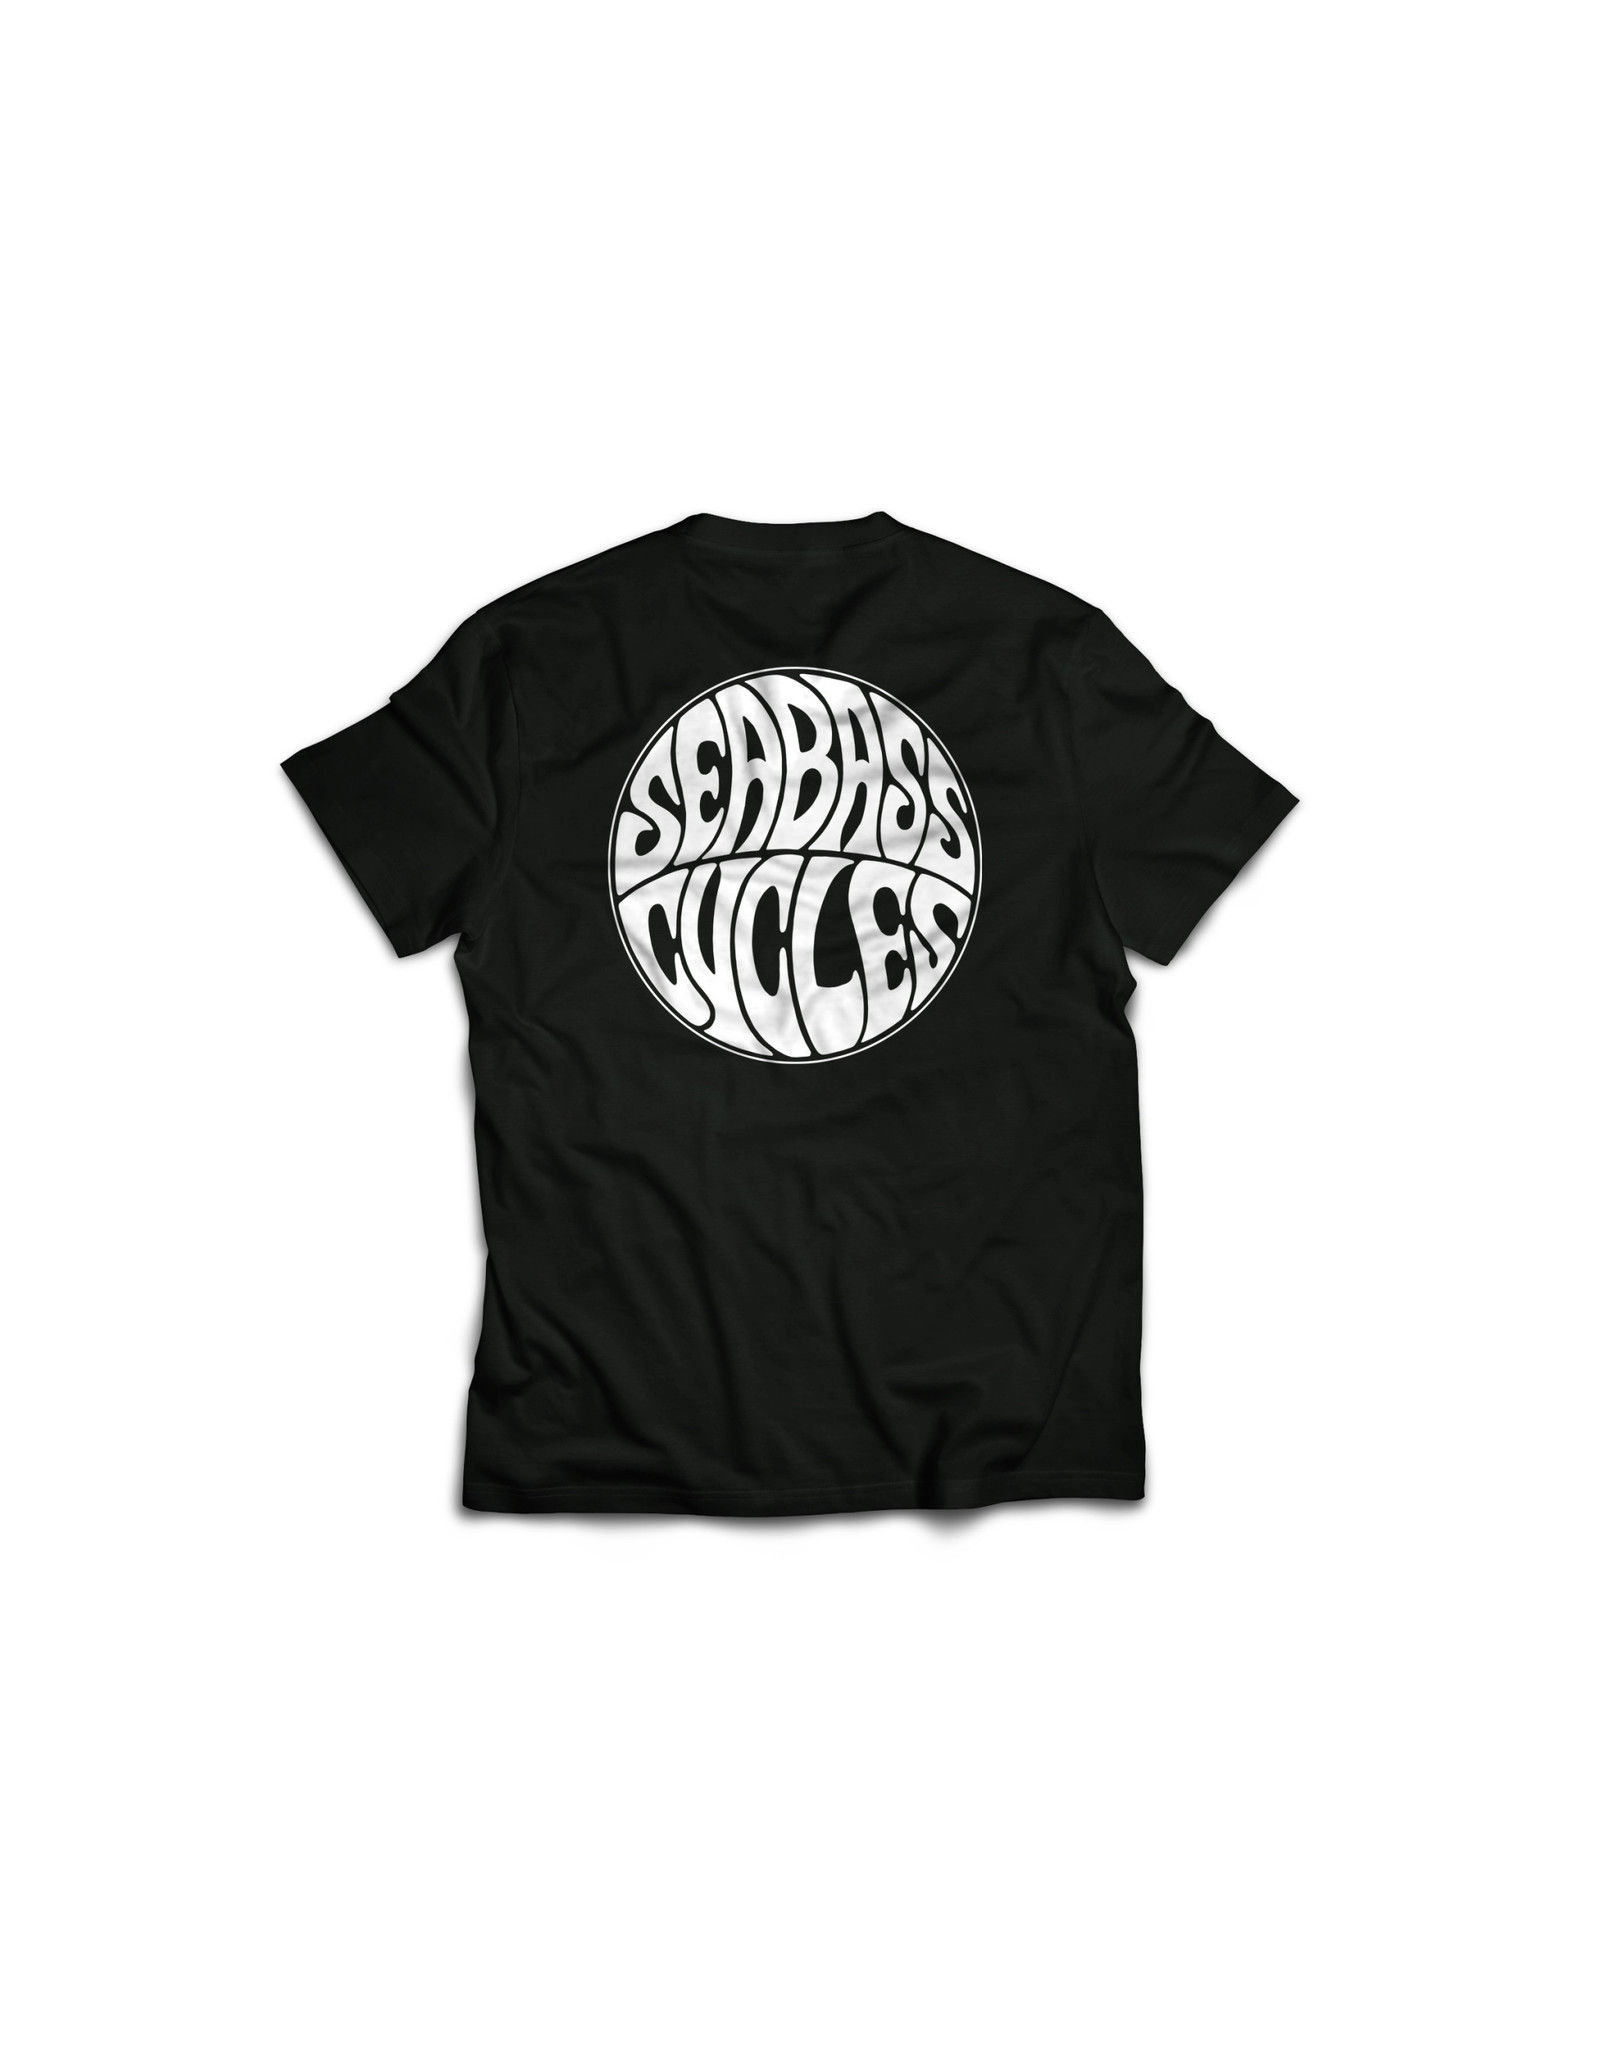 Seabass Cycles Seabass Cycles - Circle Logo - Black / White Ink